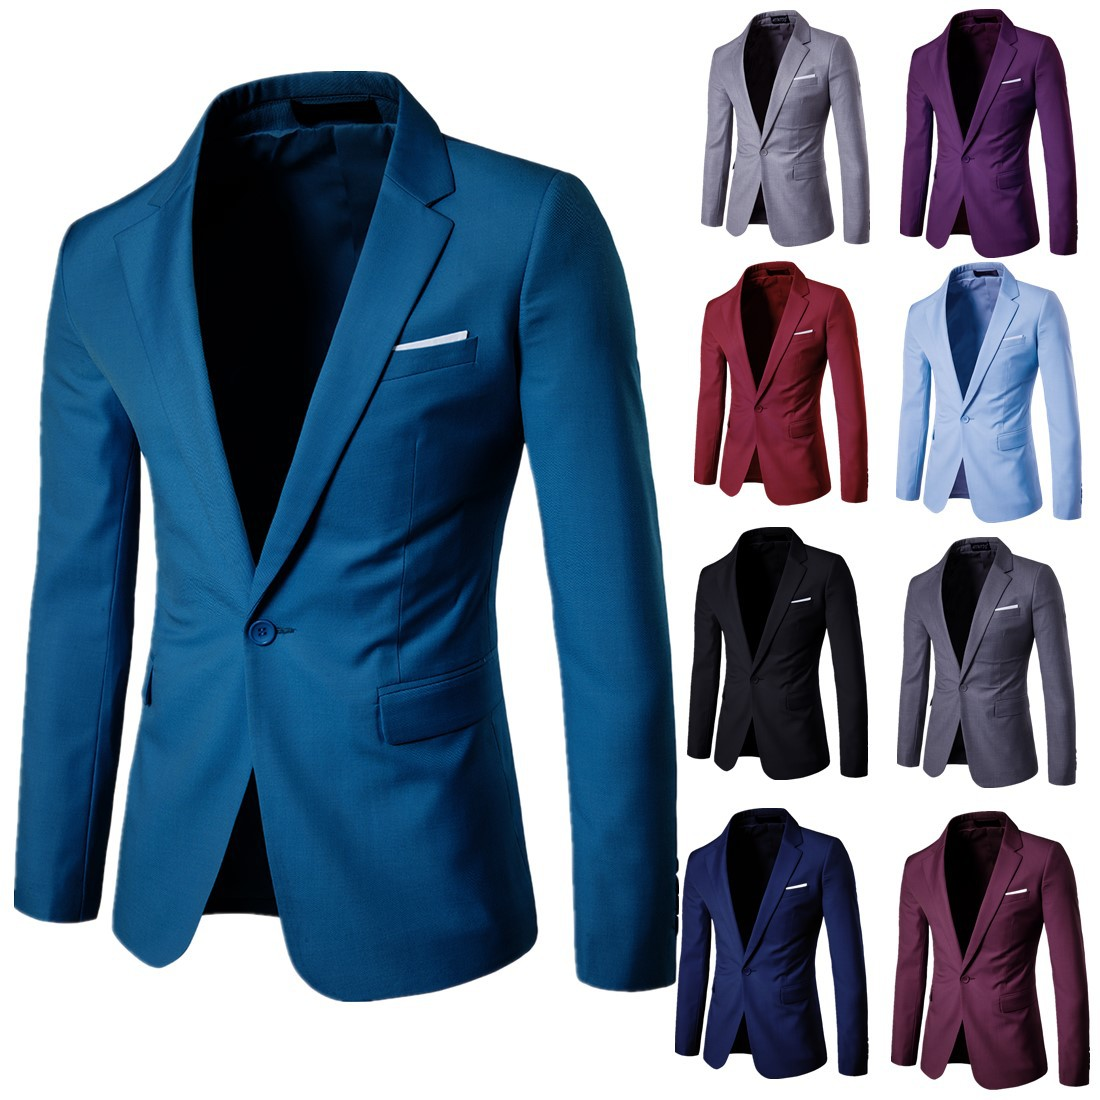 Men New Style Autumn Clothing Business Leisure Suit Best Man Wedding Korean-style Slim Fit Small Suit 9-Color Selectable